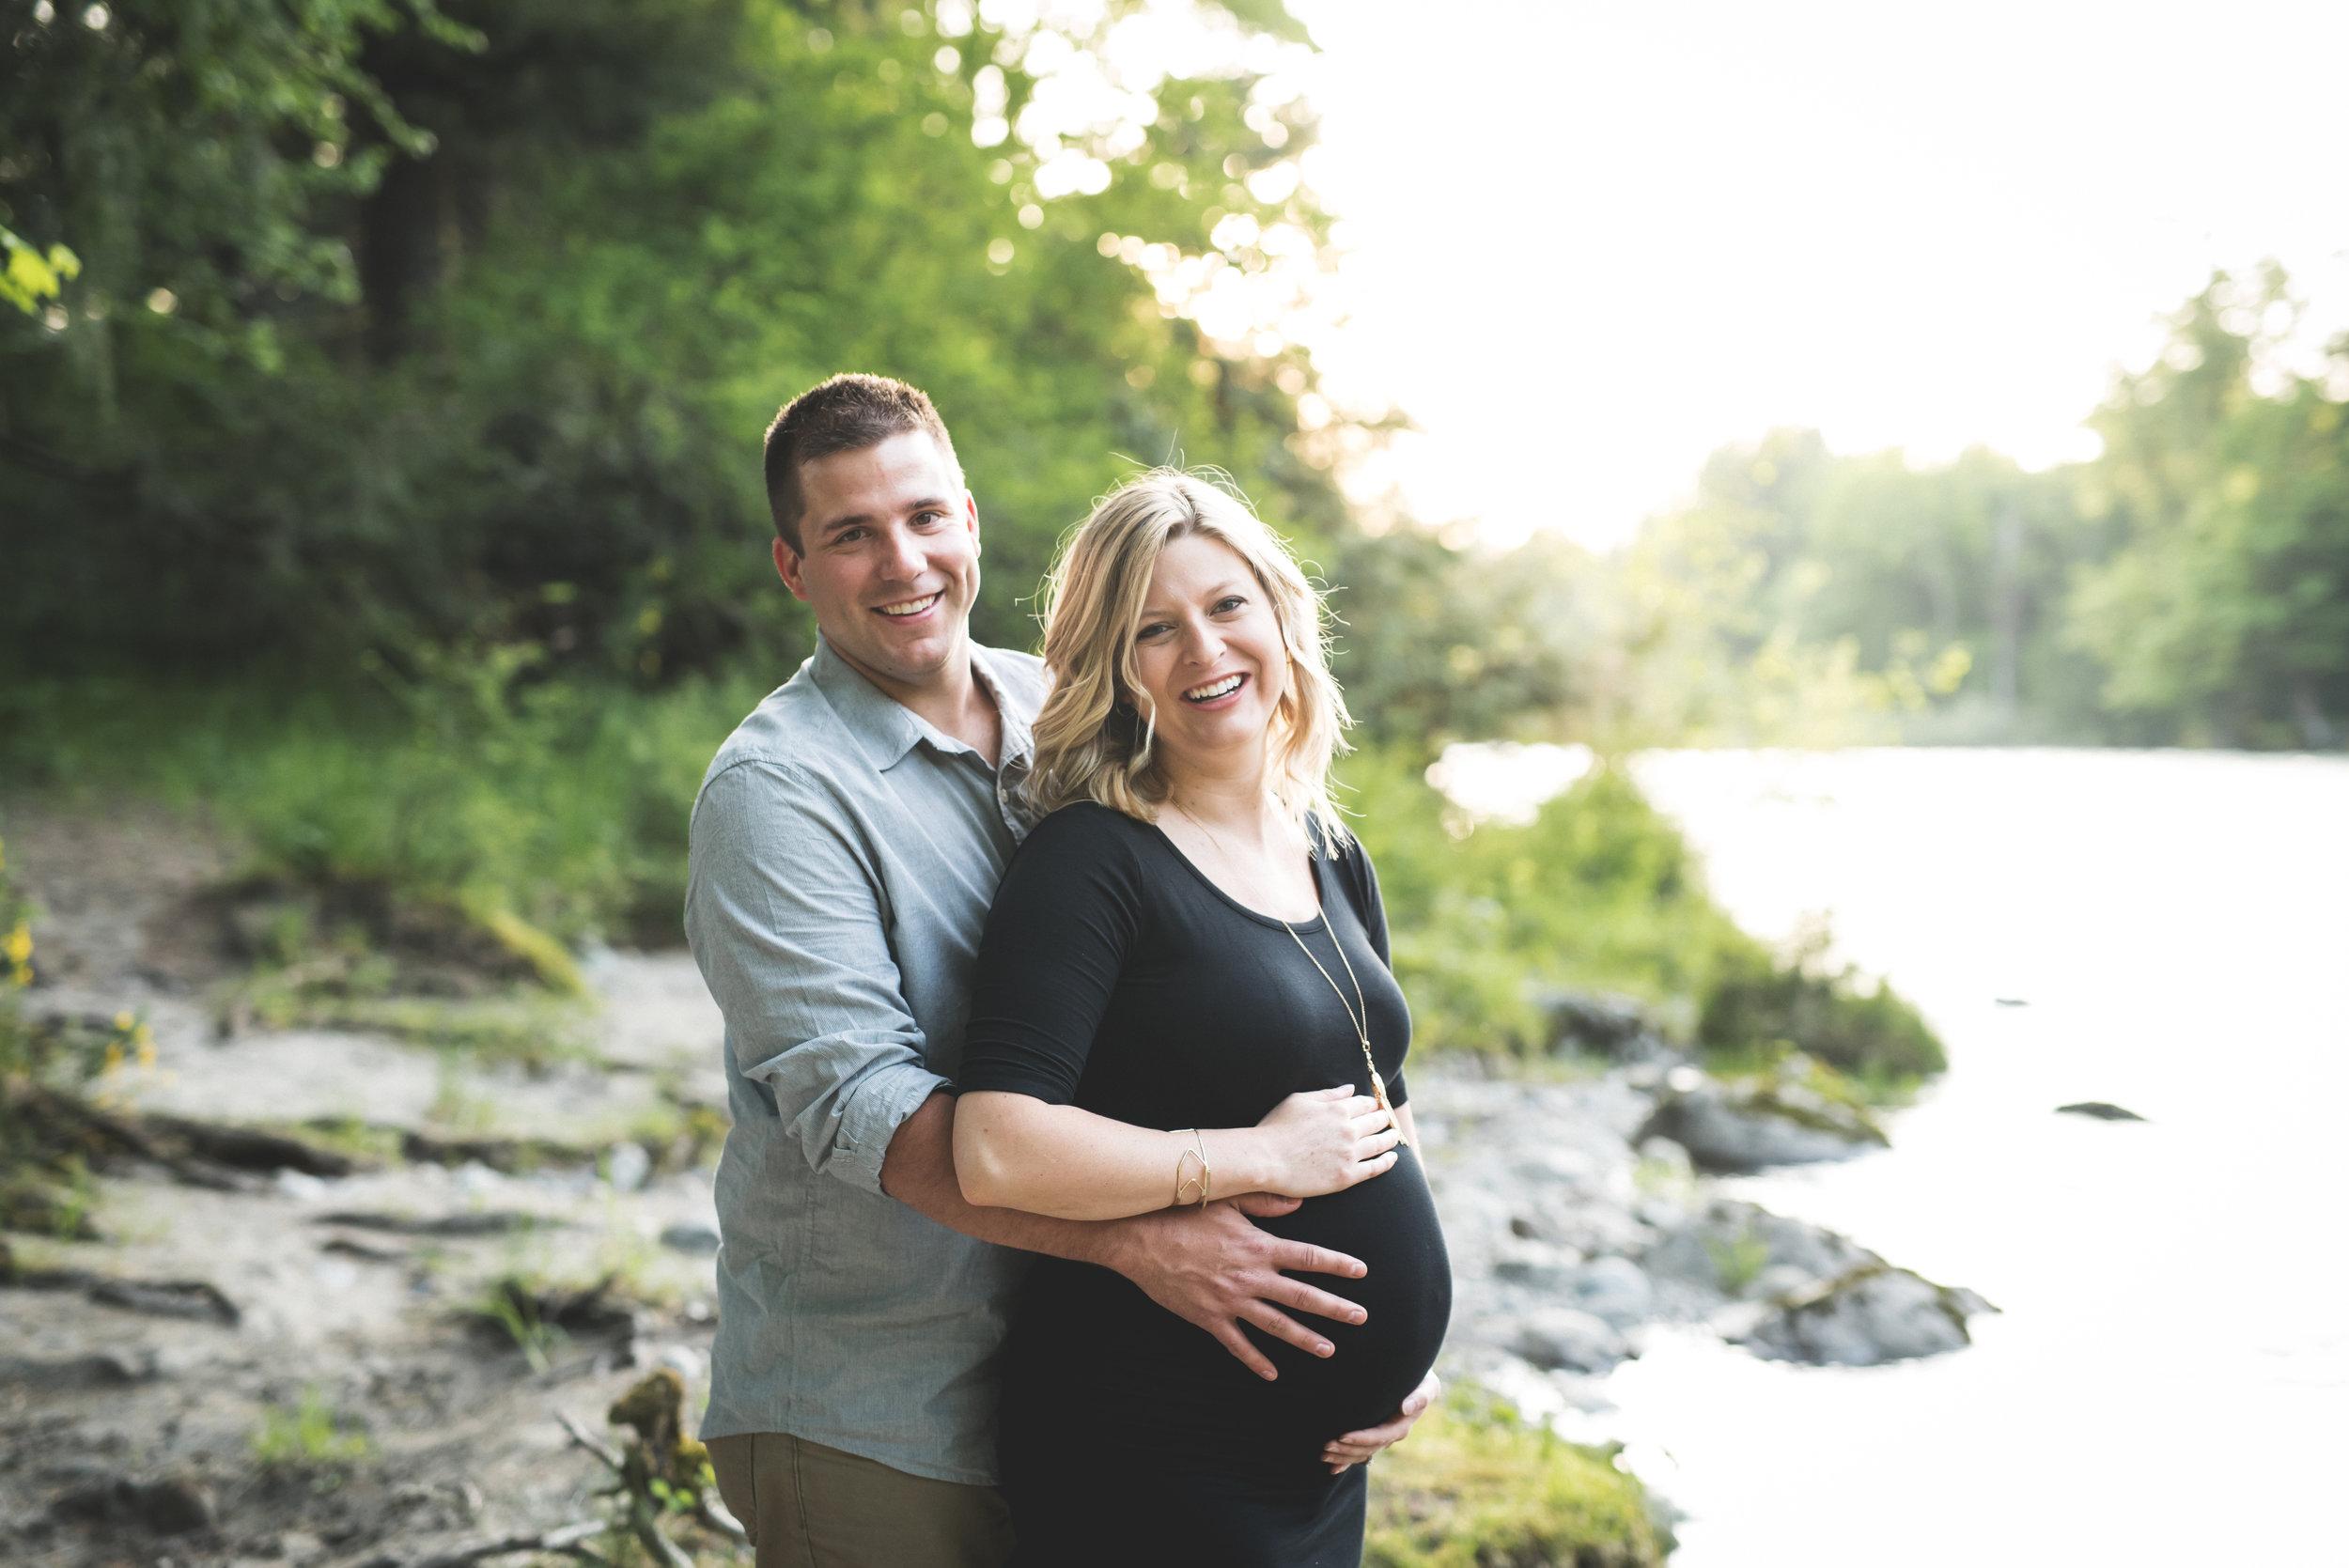 maternityphotos-kristingroverimages-9.jpg